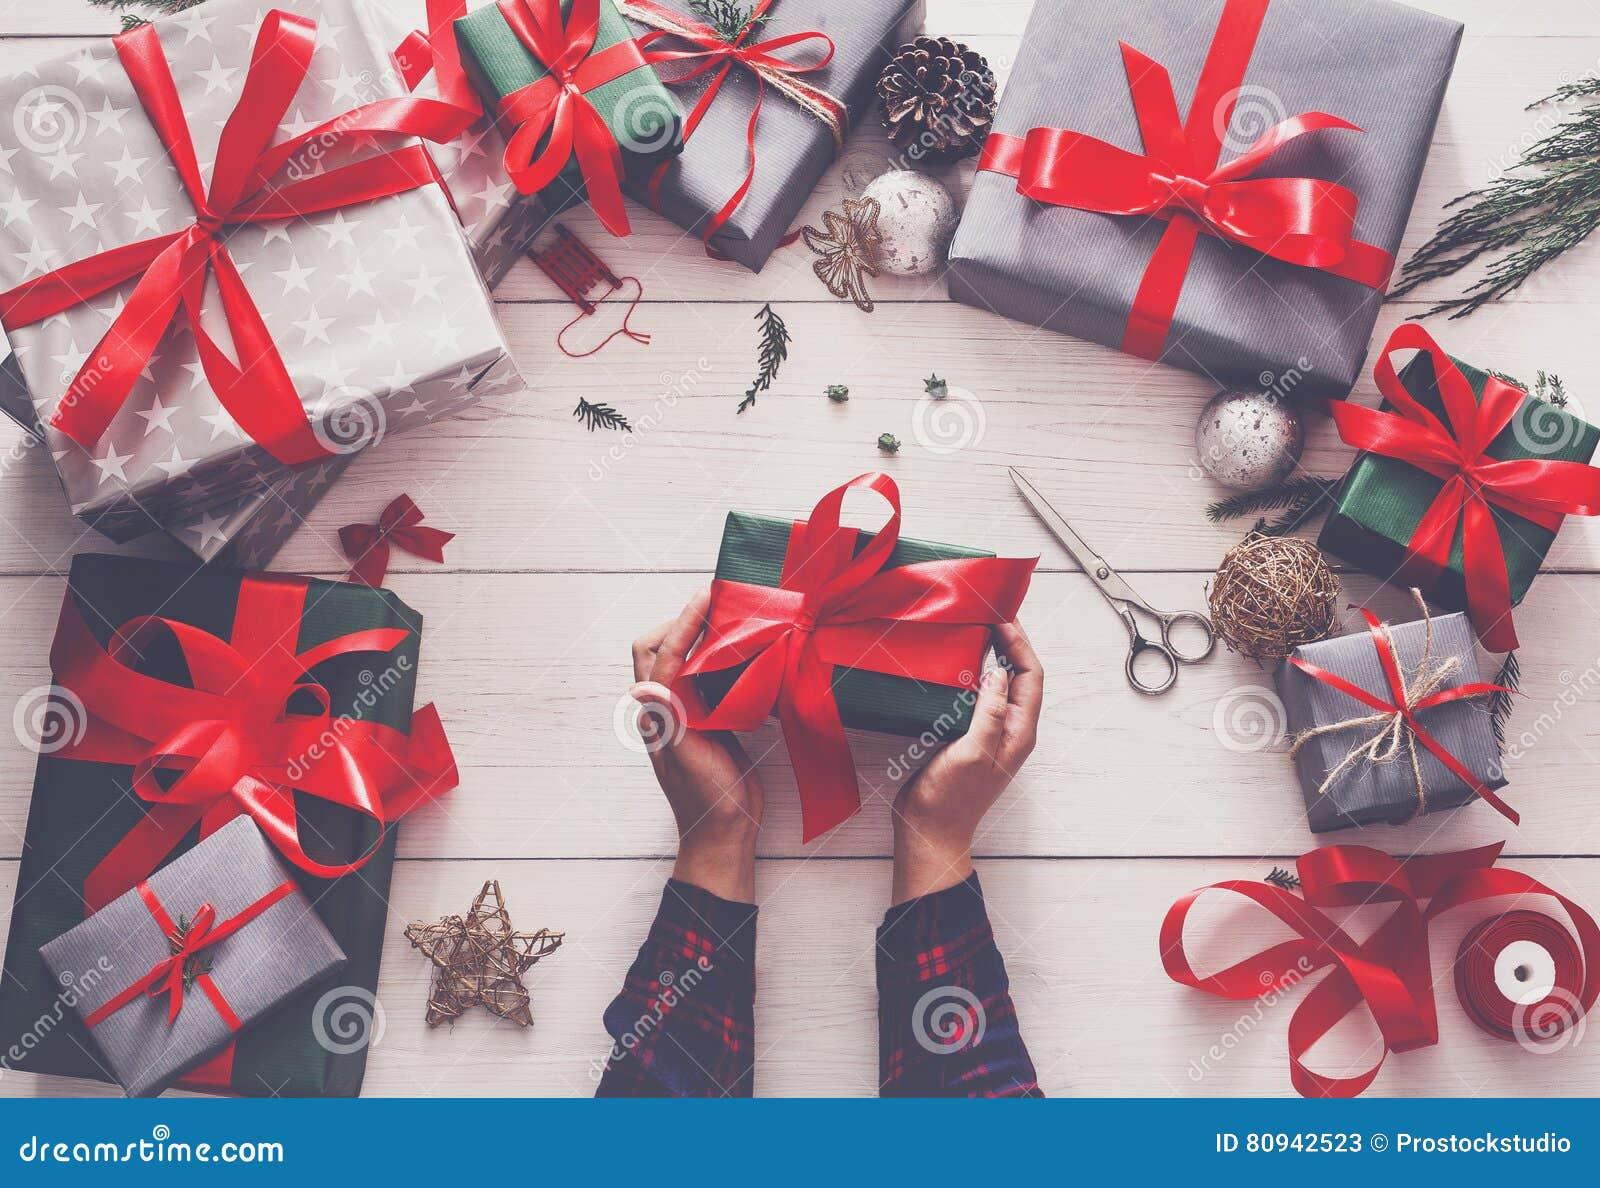 Creative Hobby Wrapping Modern Handmade Christmas Present